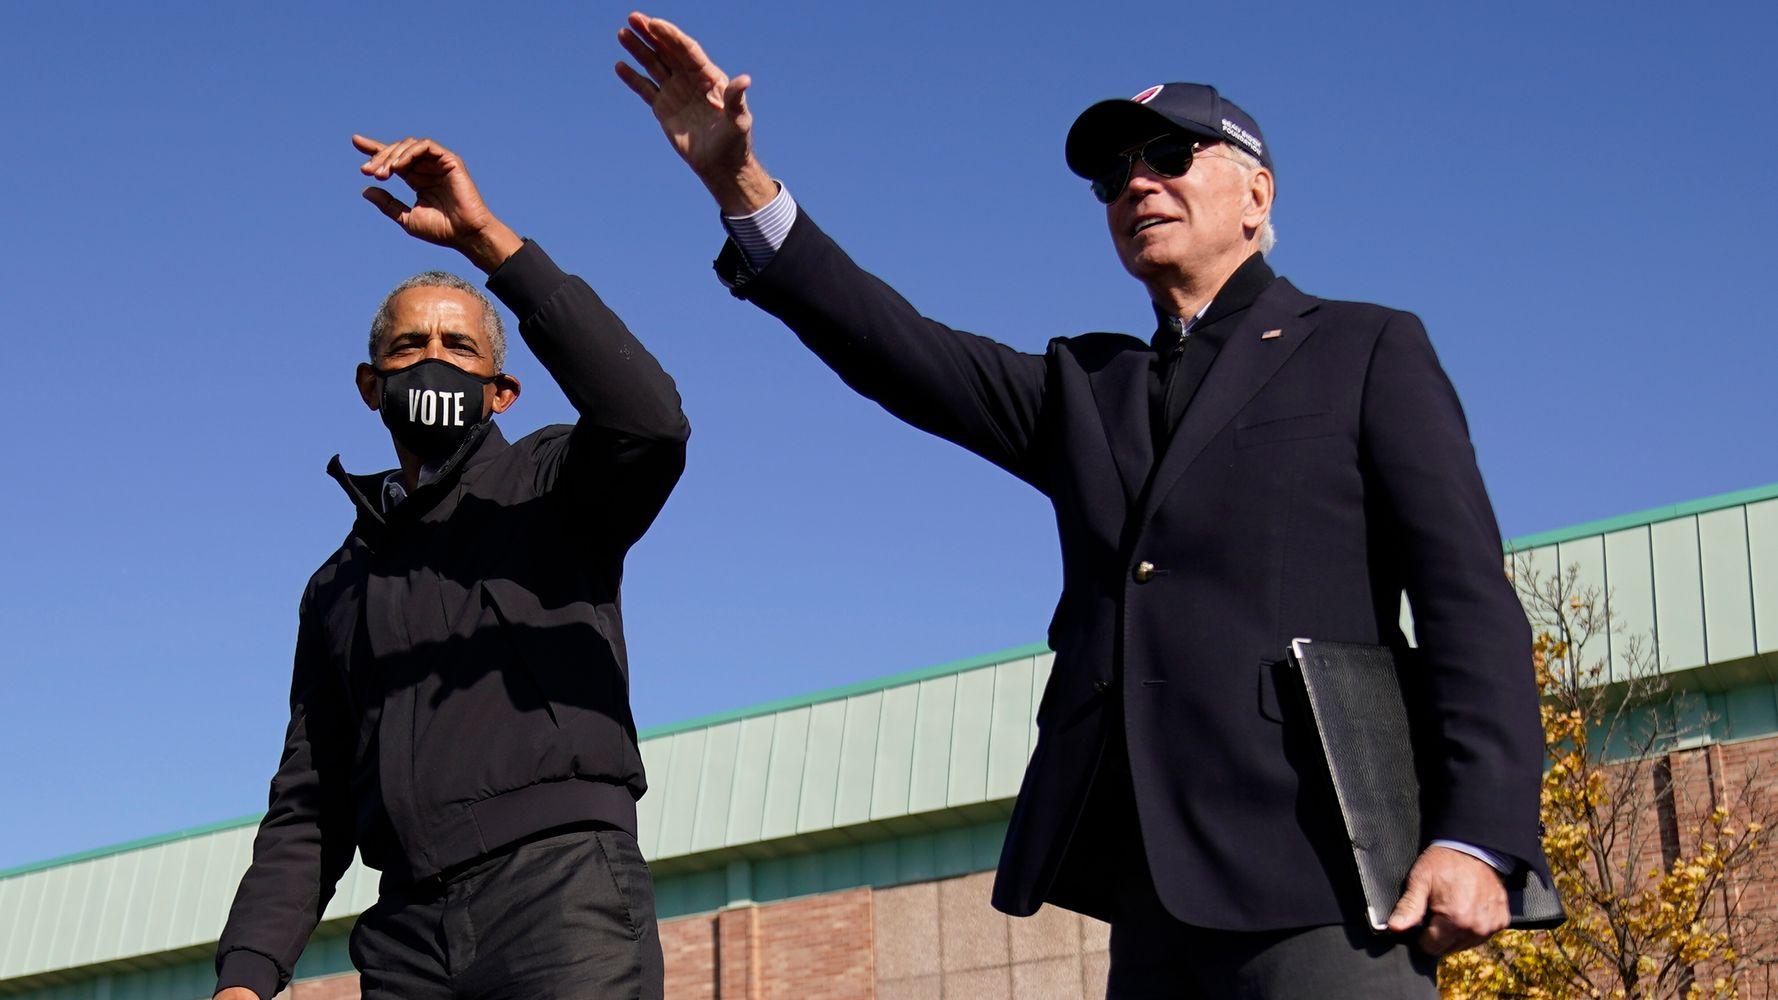 Barack Obama Congratulates Joe Biden And Kamala Harris: 'Couldn't Be Prouder'